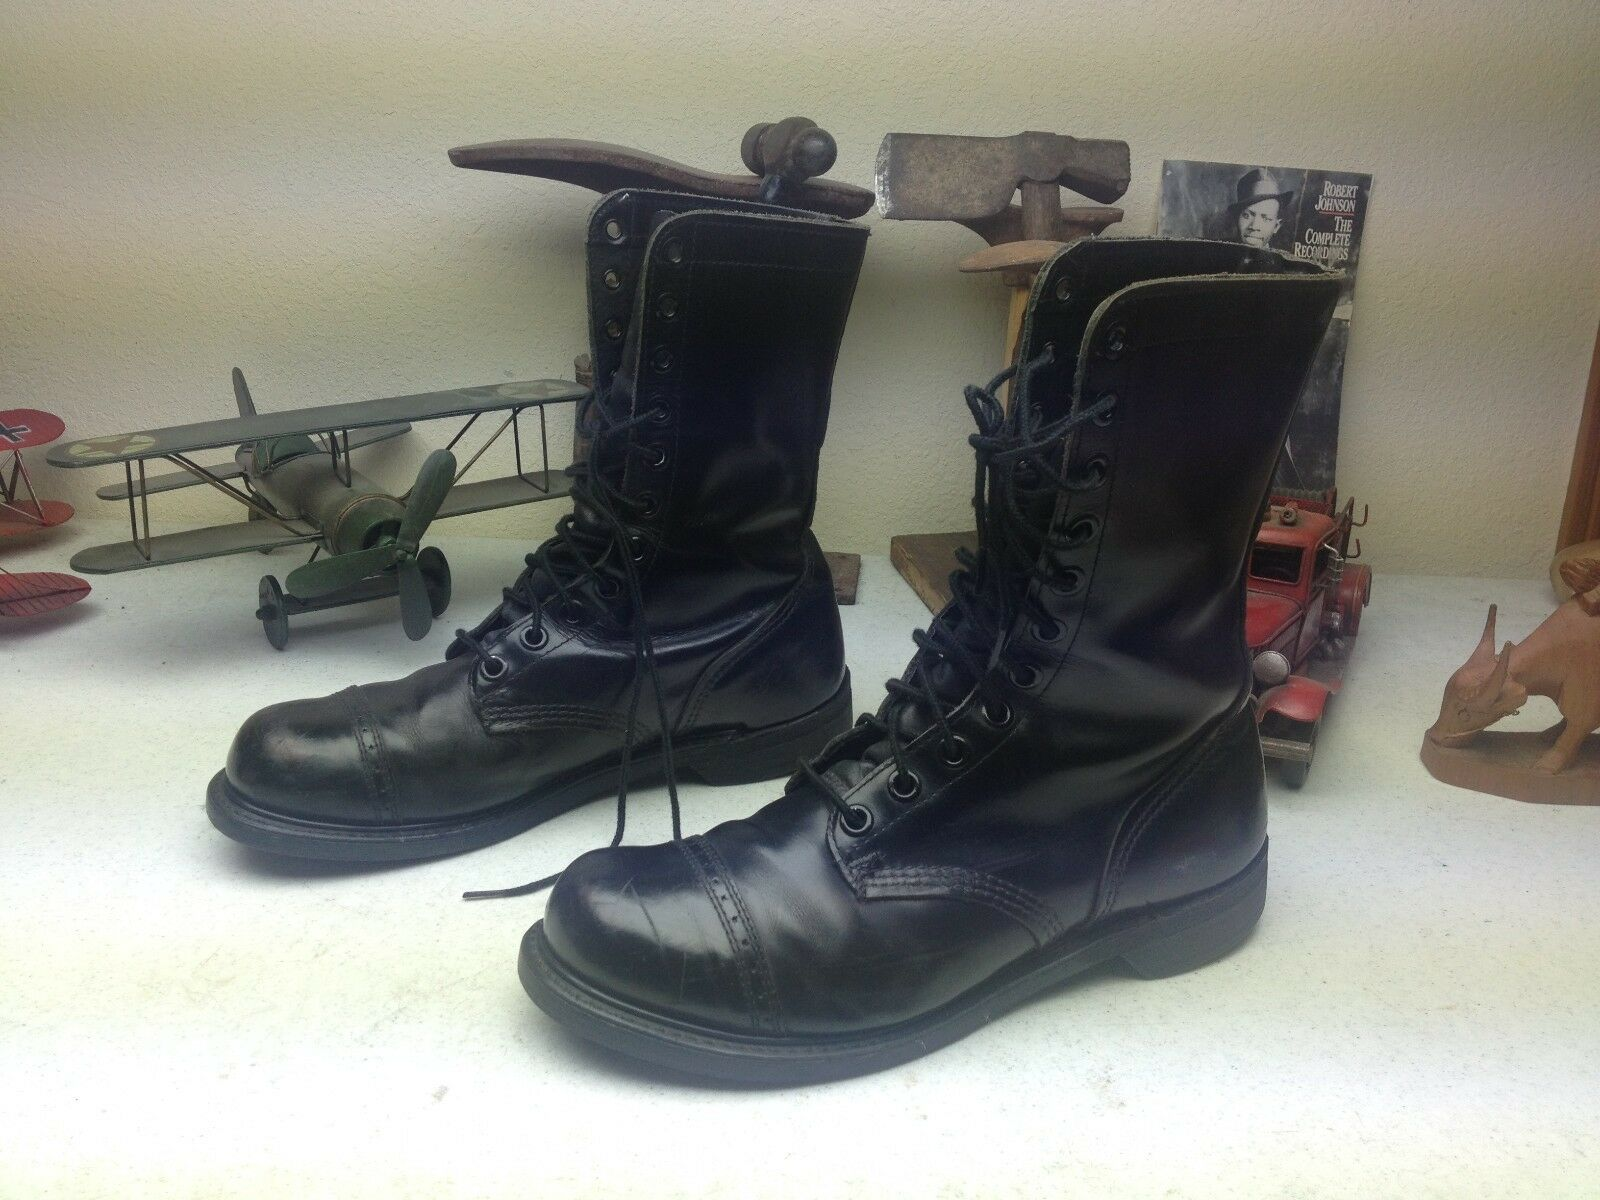 CAROLINA ROT BIRD BLACK JUMP MADE IN Stiefel USA DISTRESSED ENGINEER BOSS Stiefel IN 11 D 5ddb9a